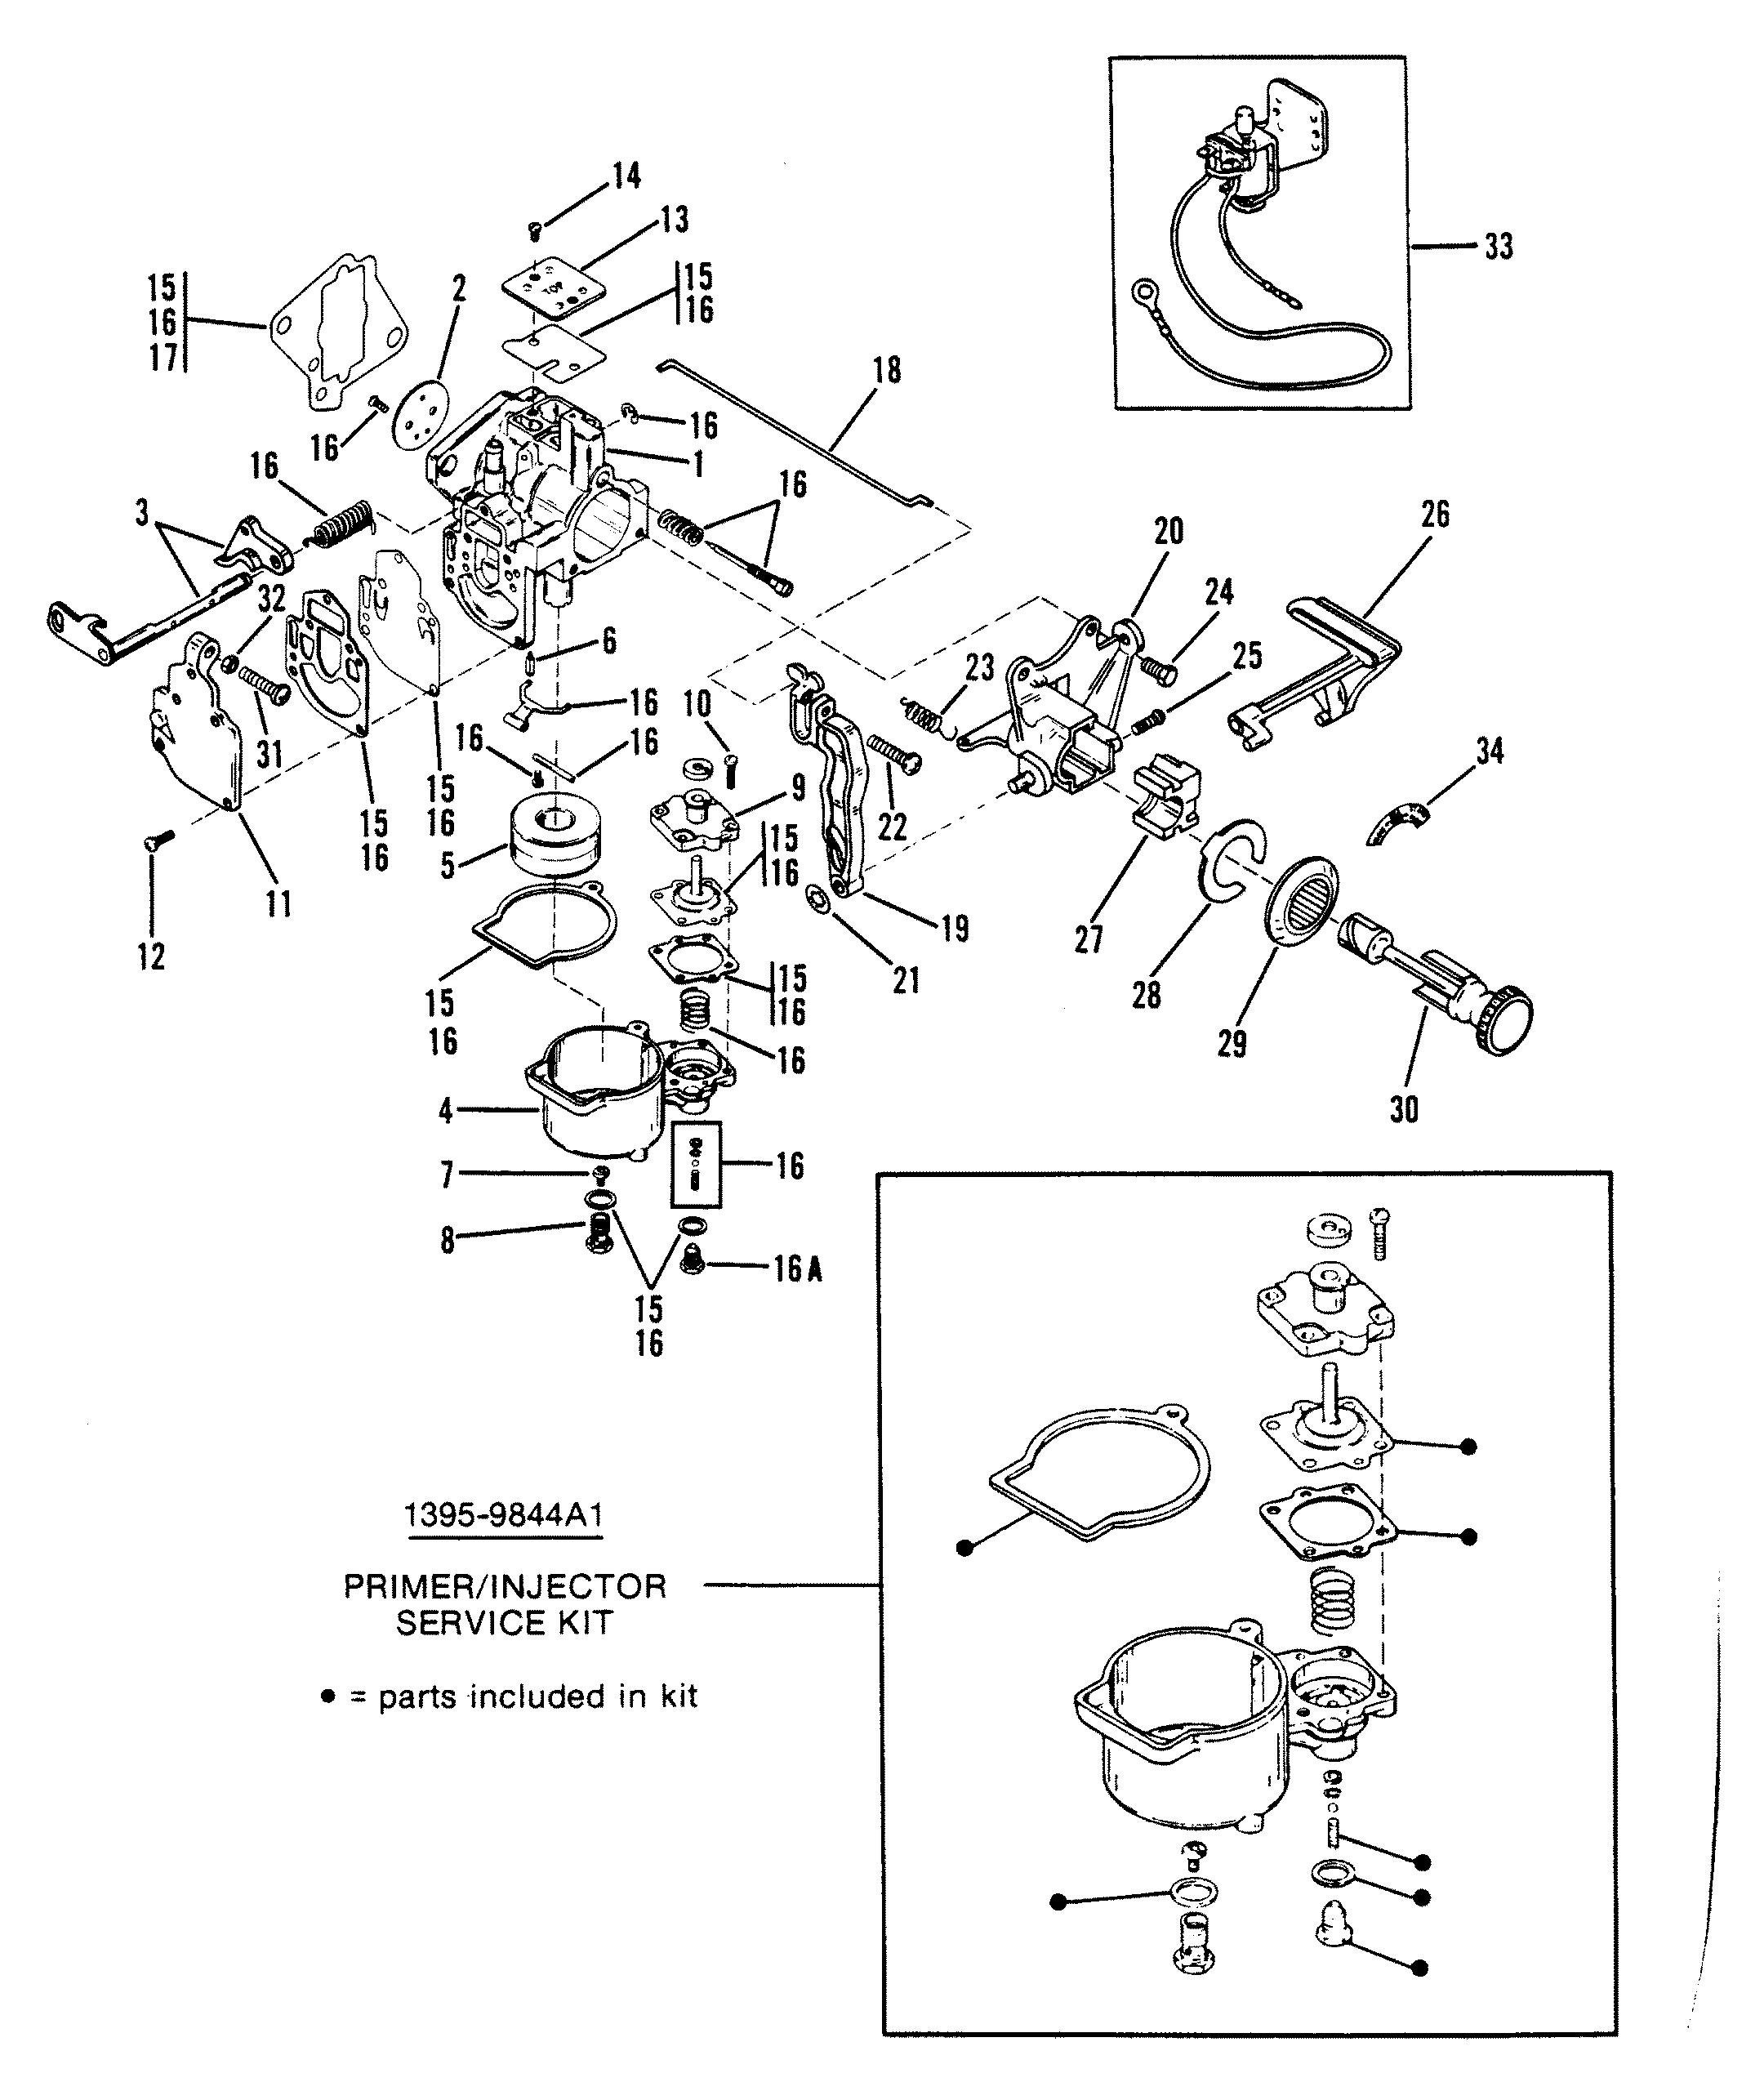 Carburetor Assembly Wmc5a Wmc5b Wmc7 Wmc7a Wmc19 Wmc19a